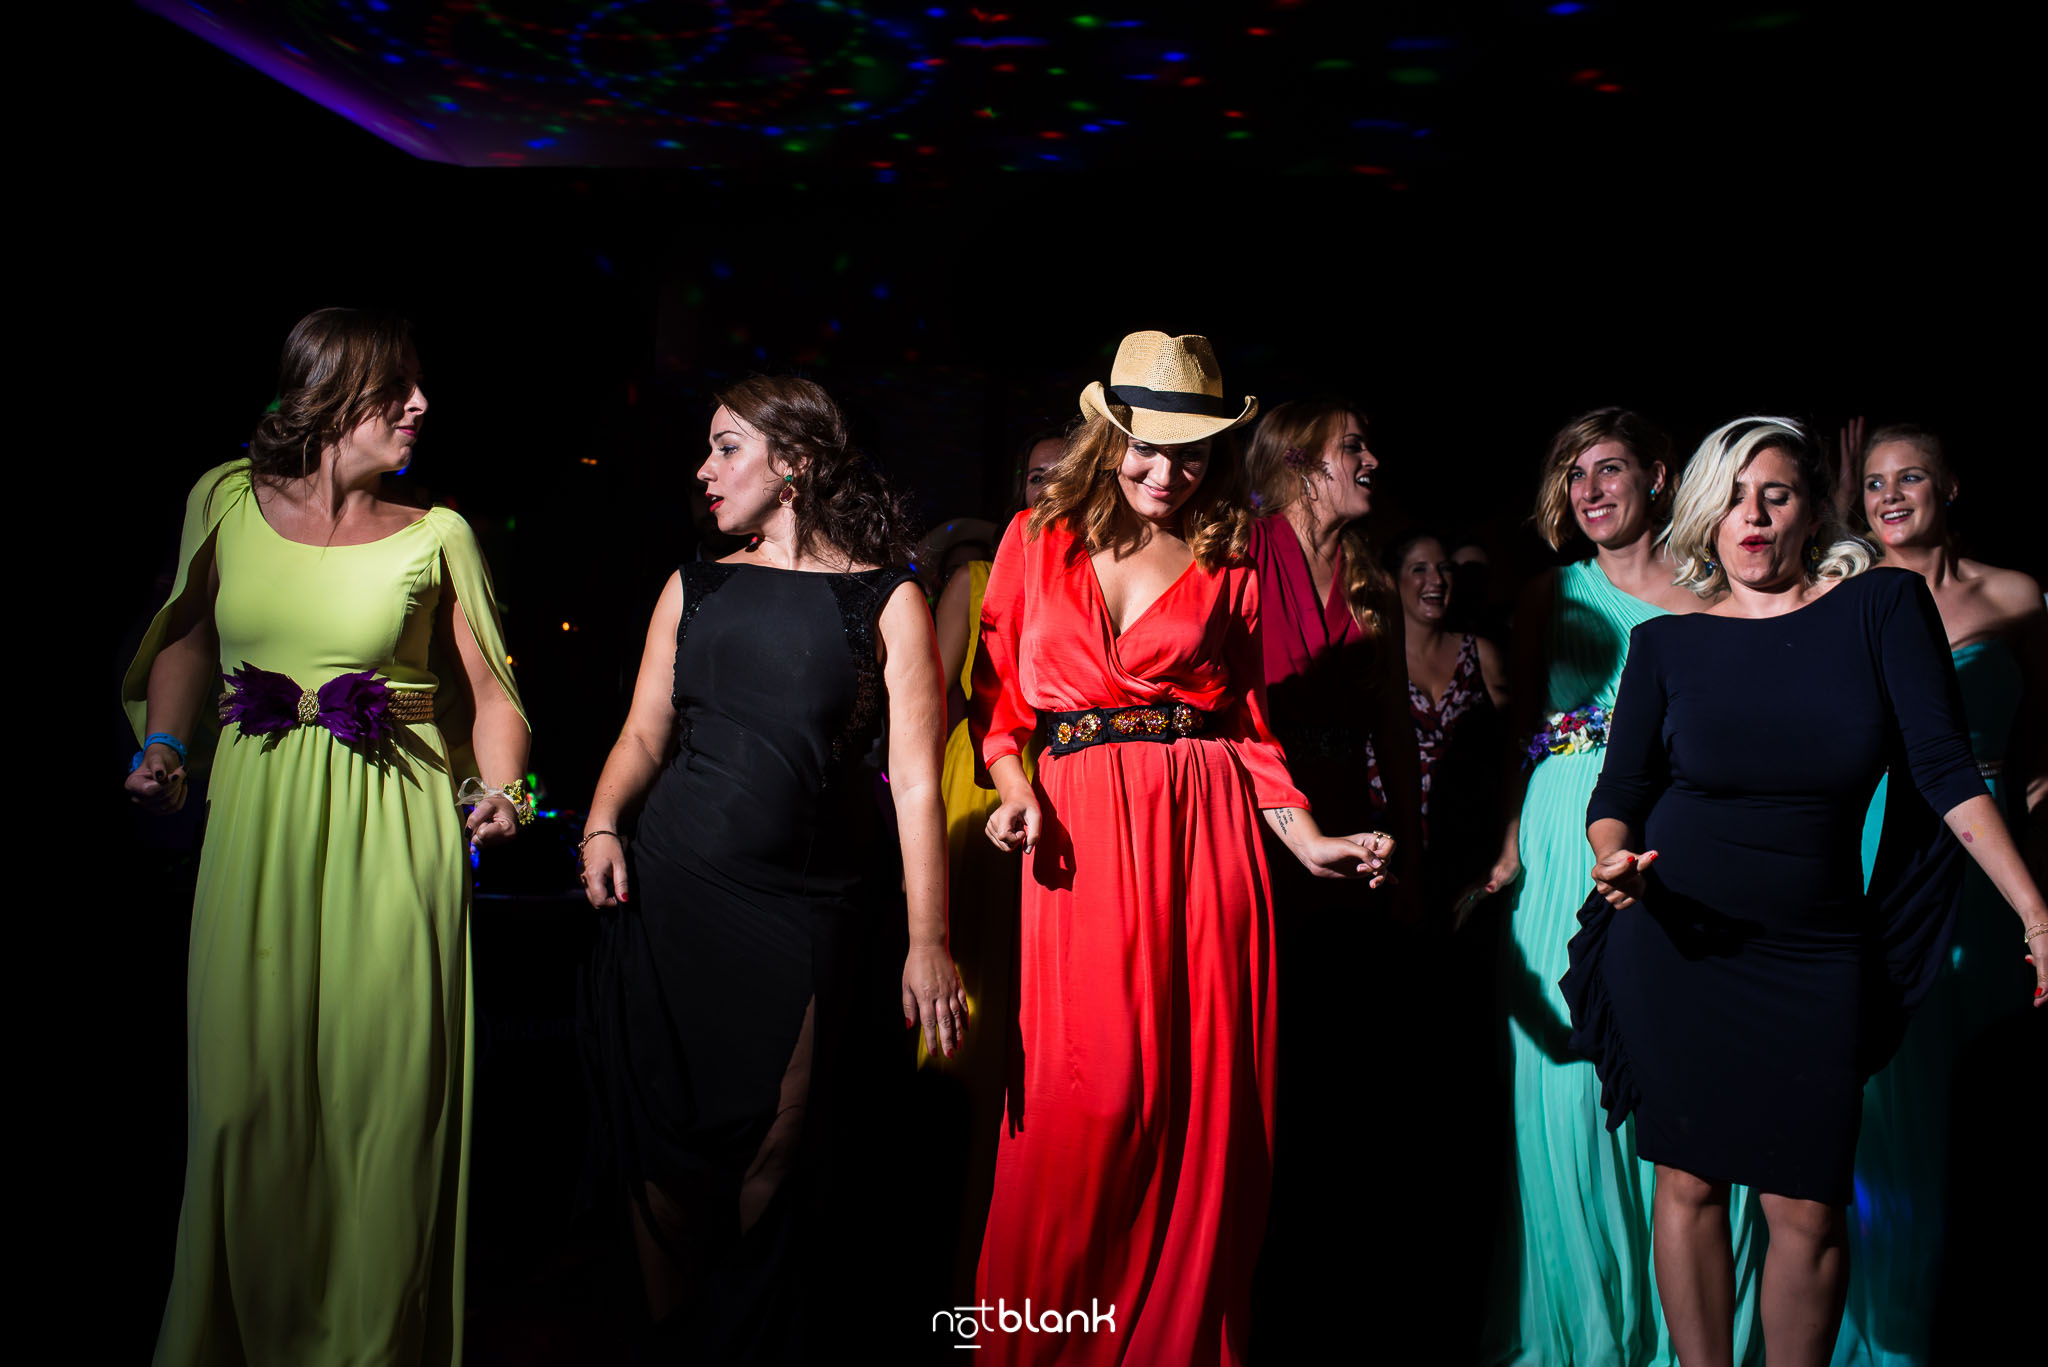 Notblank-Boda Tematica-Star Wars-Malaposta-Portugal-Fotógrafo de boda-Fiesta-Baile